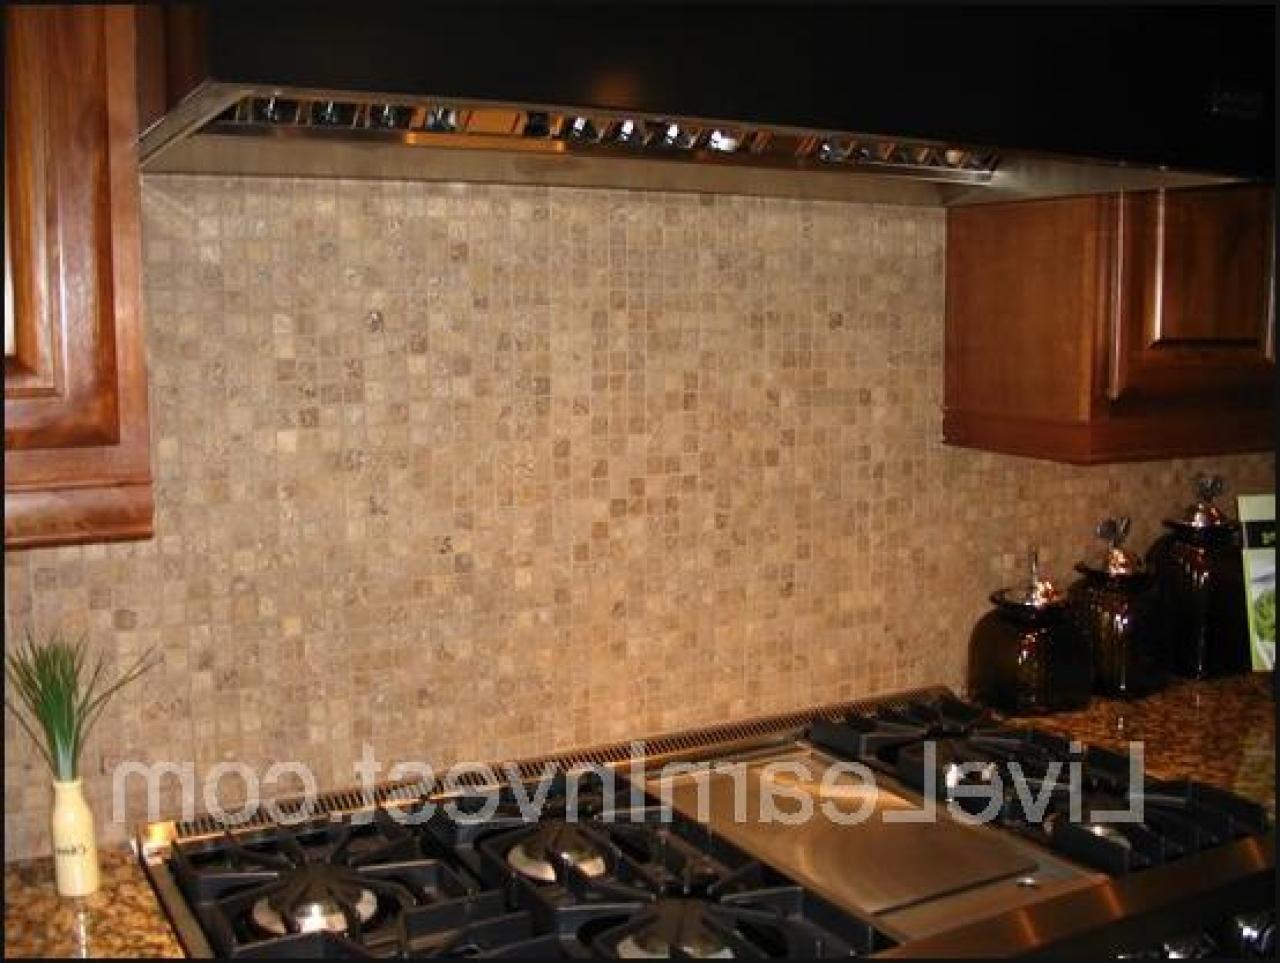 Uncategorized Washable Wallpaper For Kitchen Backsplash for backsplash in kitchen wallpaper kitchen